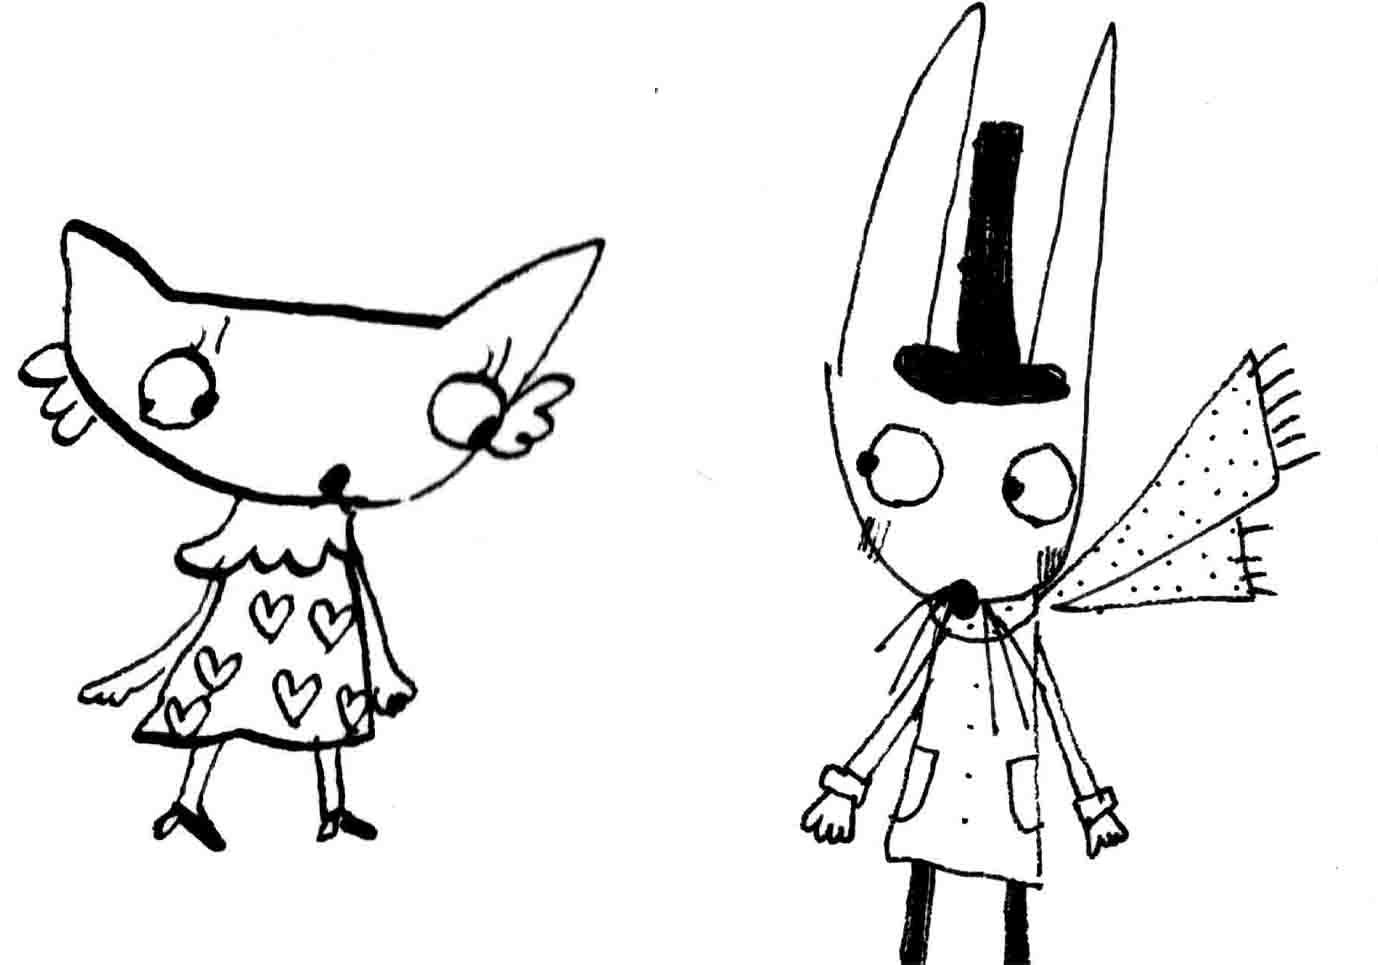 Yokococo Illustration (yokococonuts23@gmail.com